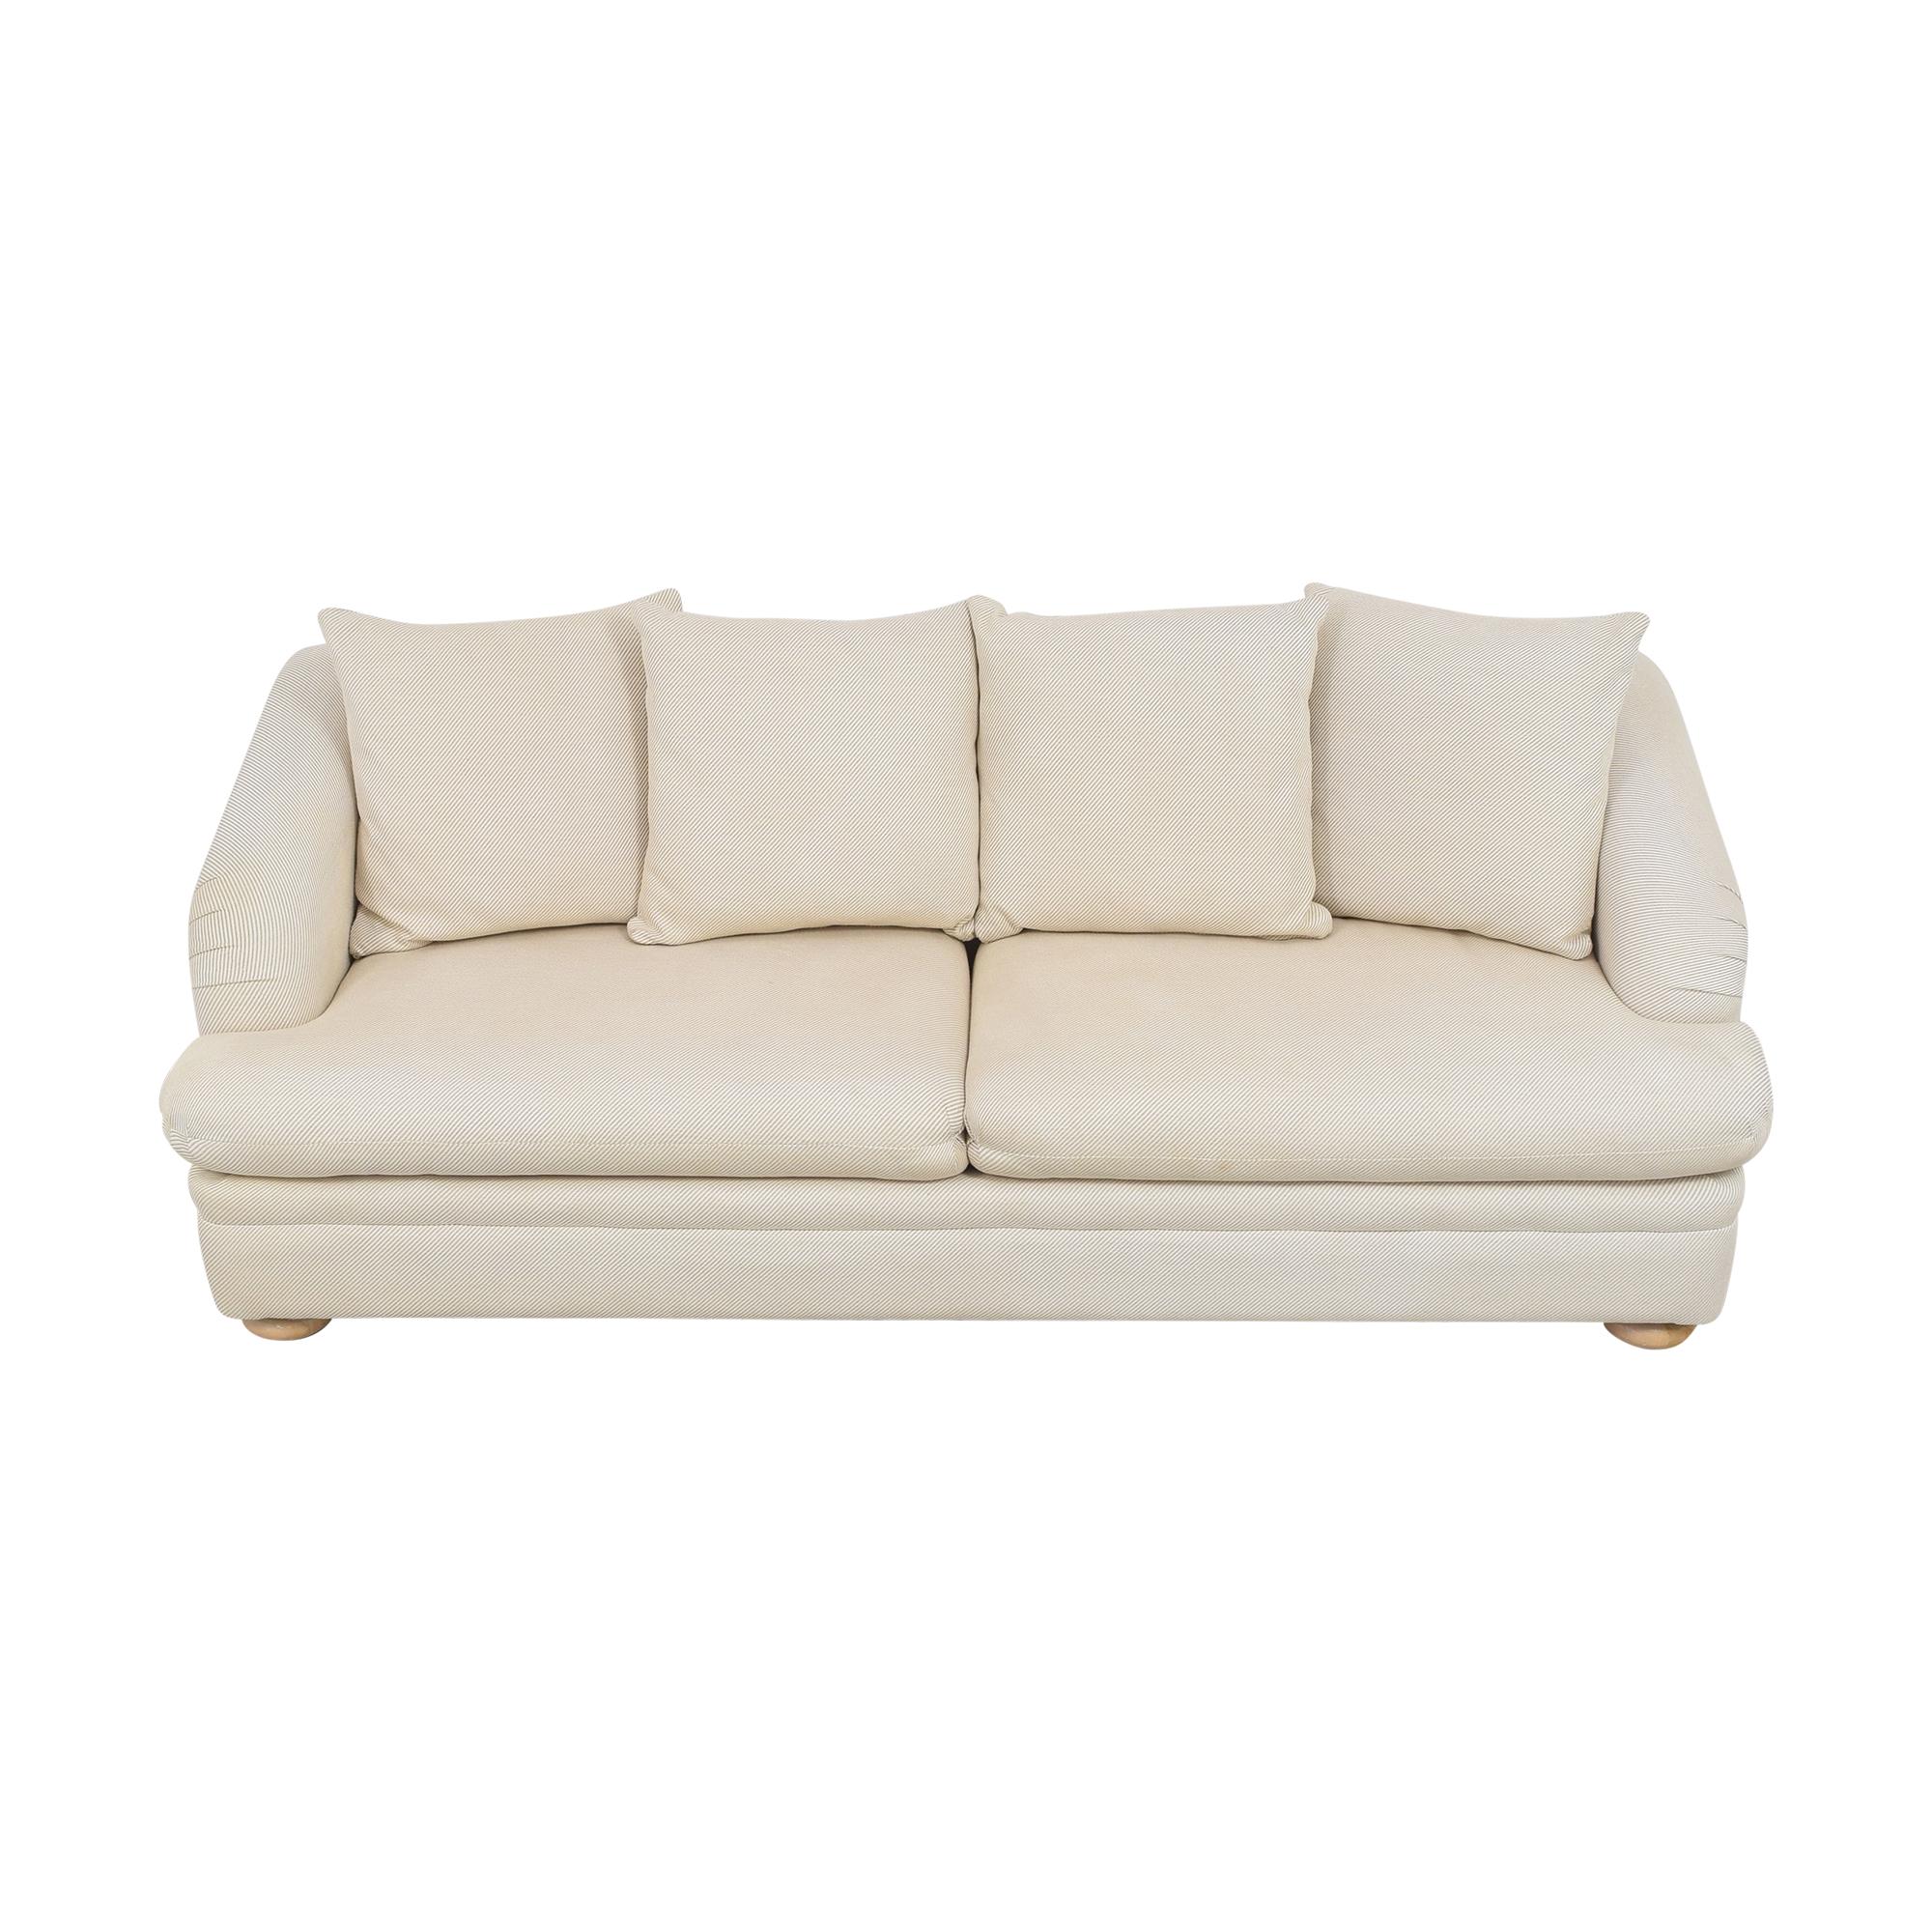 buy McCreary Modern McCreary Modern English Roll Arm Sofa online